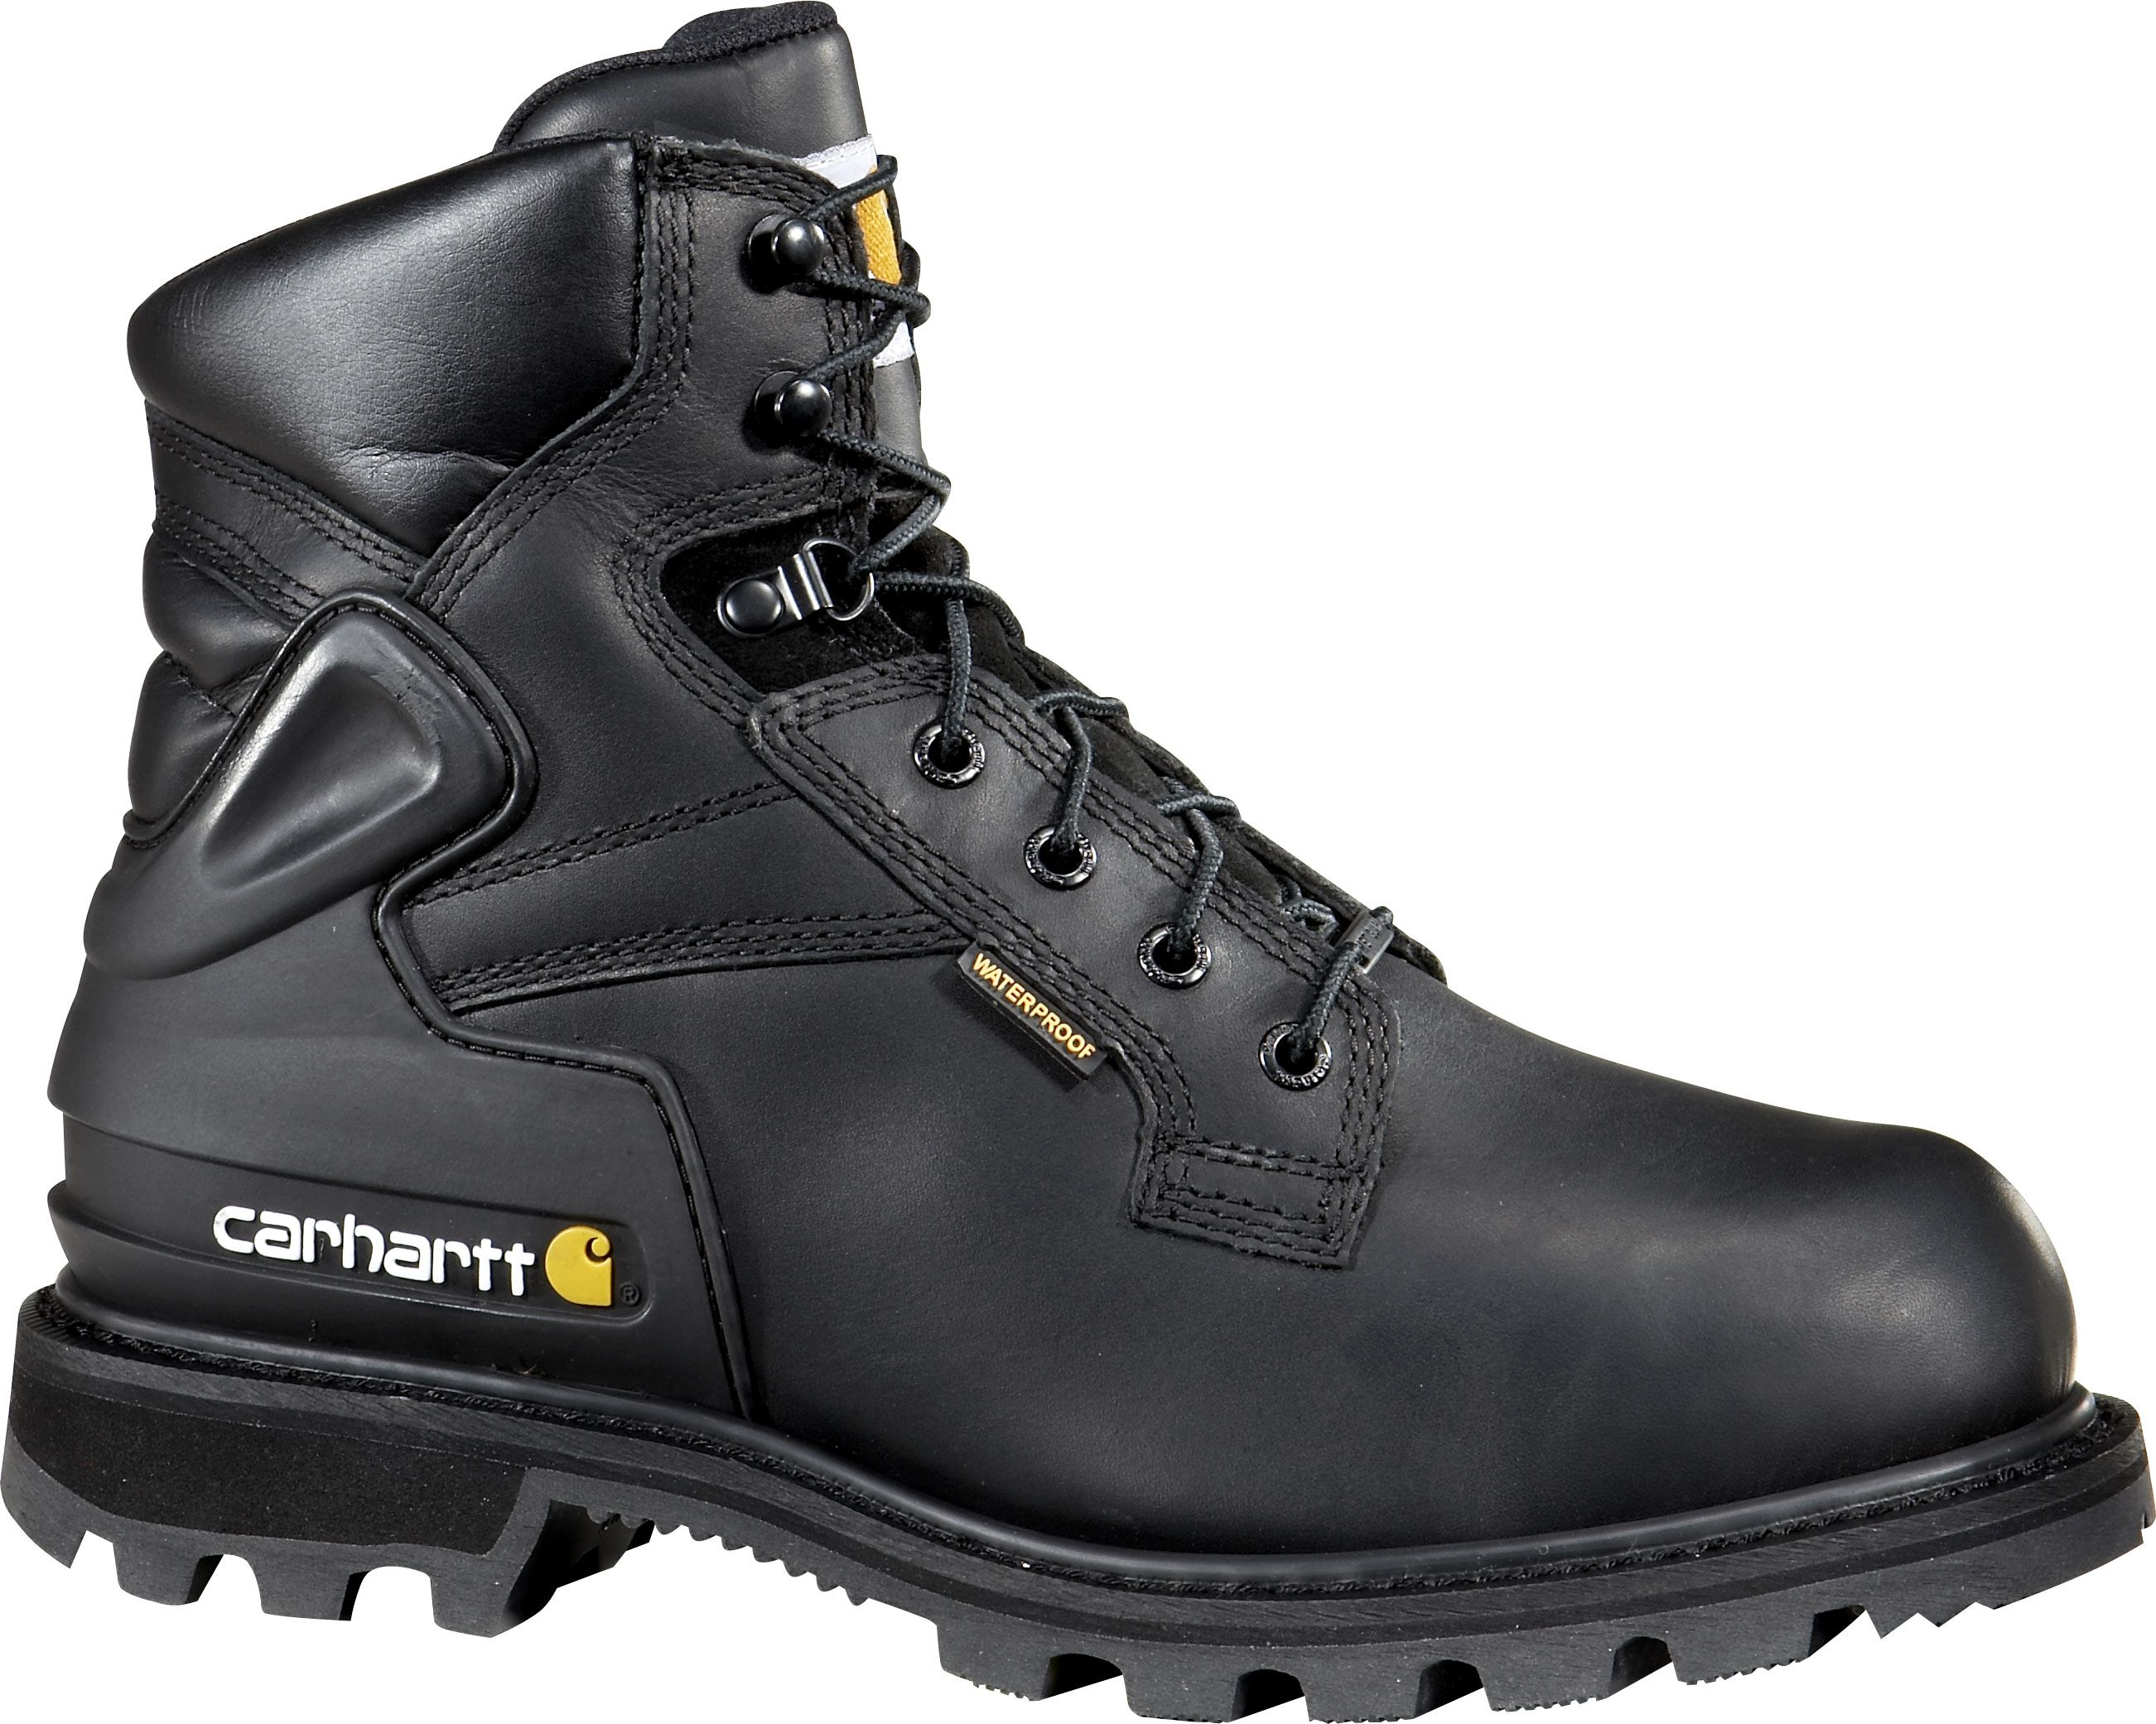 CMW6610 Carhartt Men's Waterproof Safety Boots Black